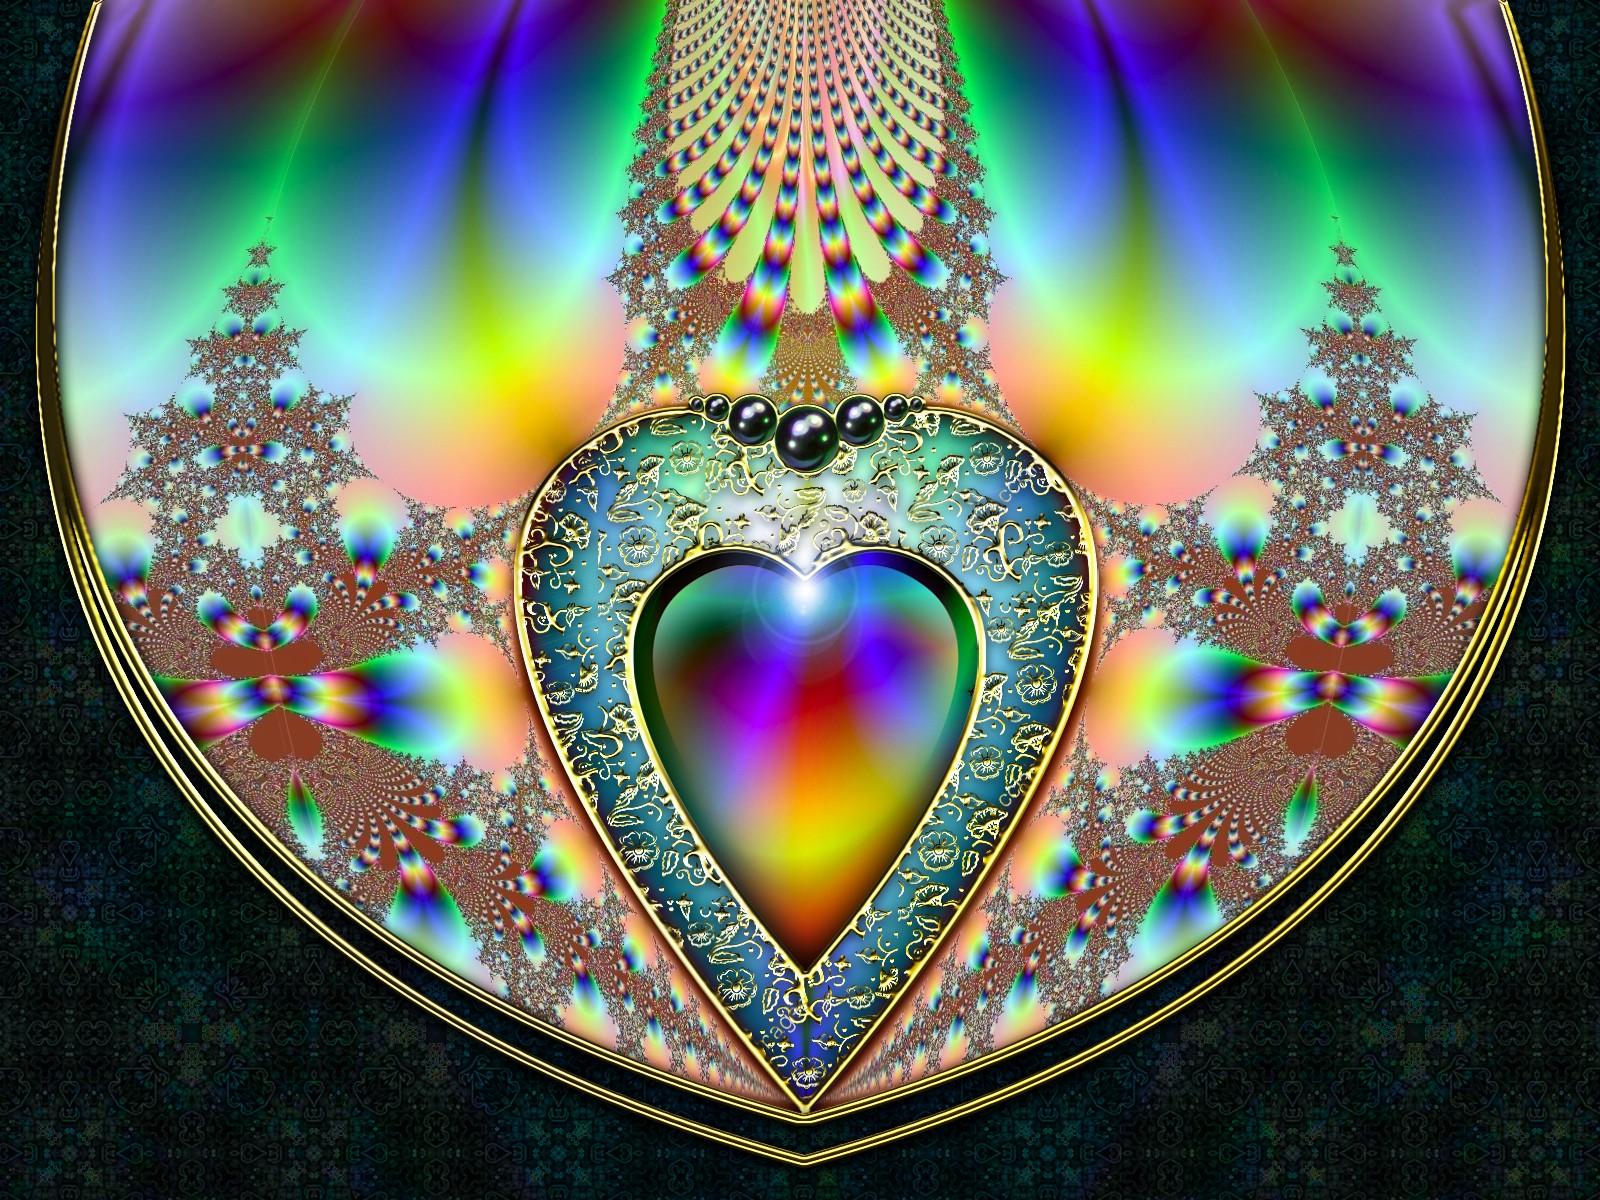 rainbow fractal wallpaper - photo #20